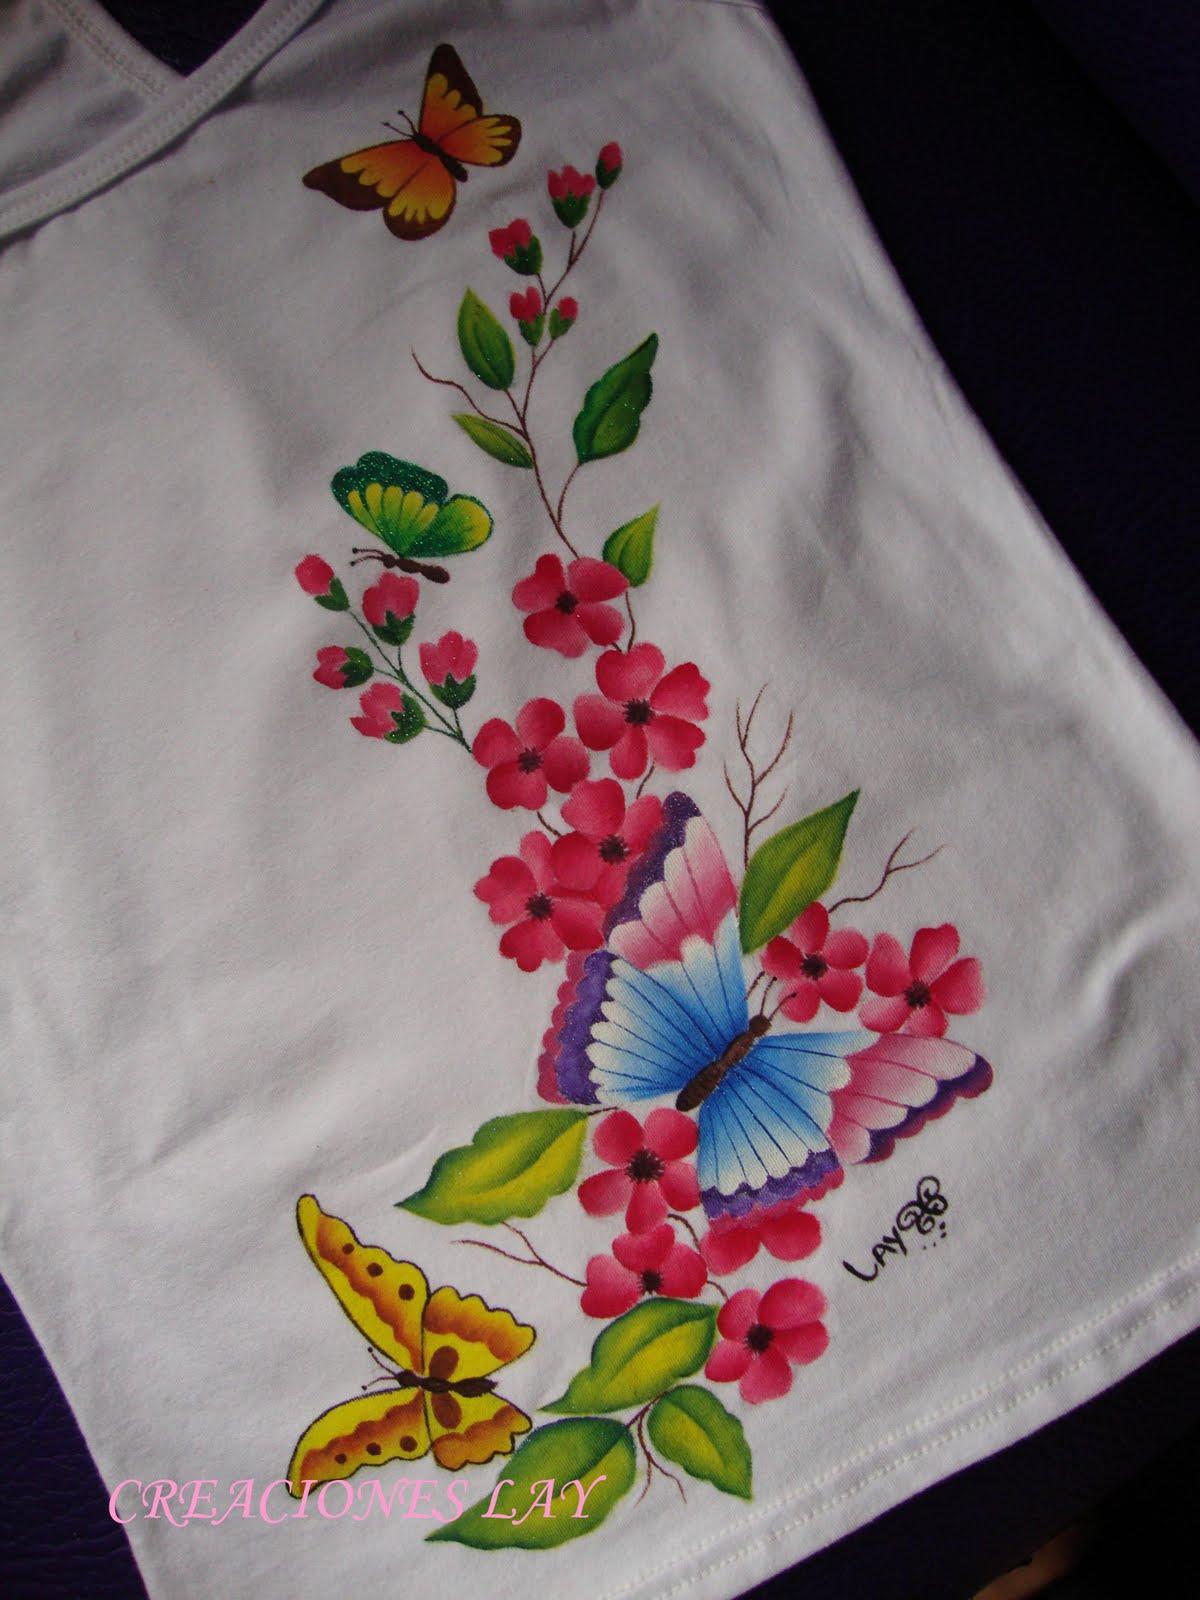 Imagenes flores pintadas en tela - Imagui